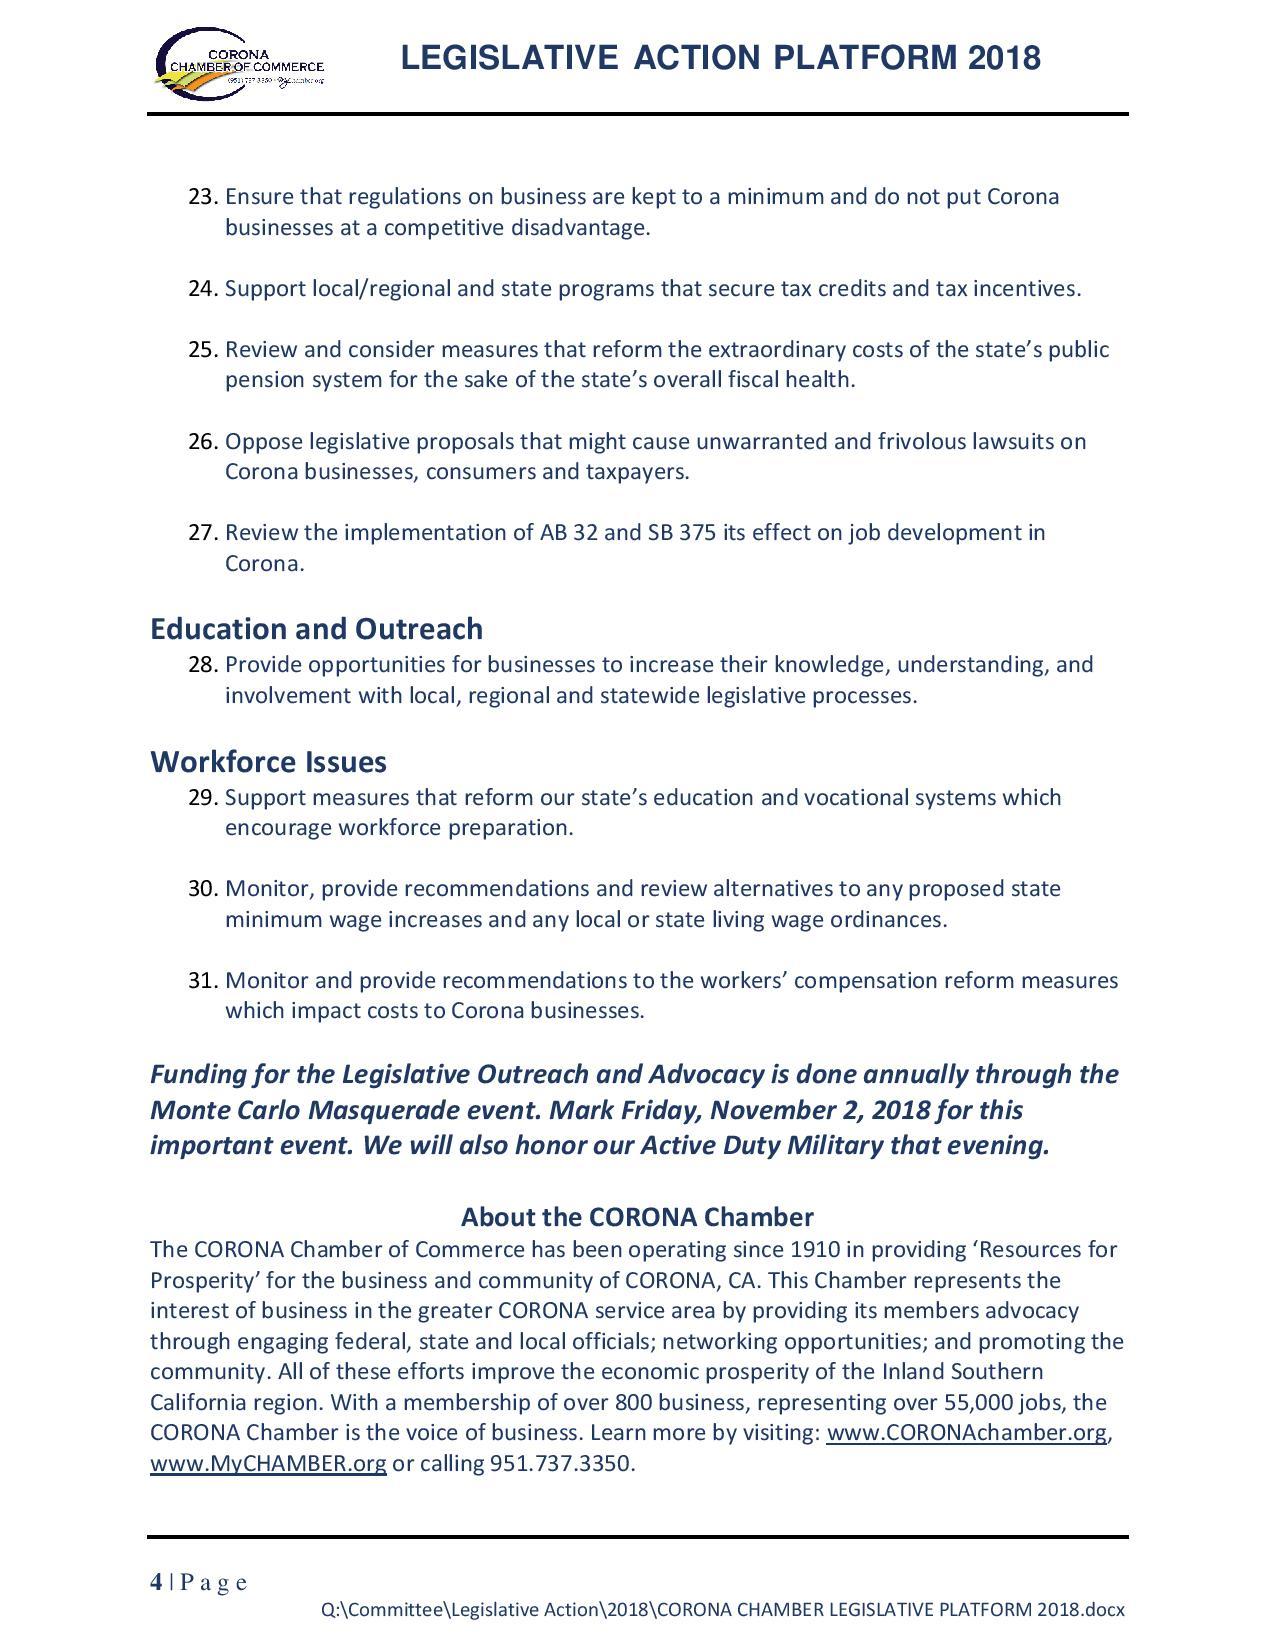 CORONA-CHAMBER-LEGISLATIVE-PLATFORM-2018-page-004.jpg